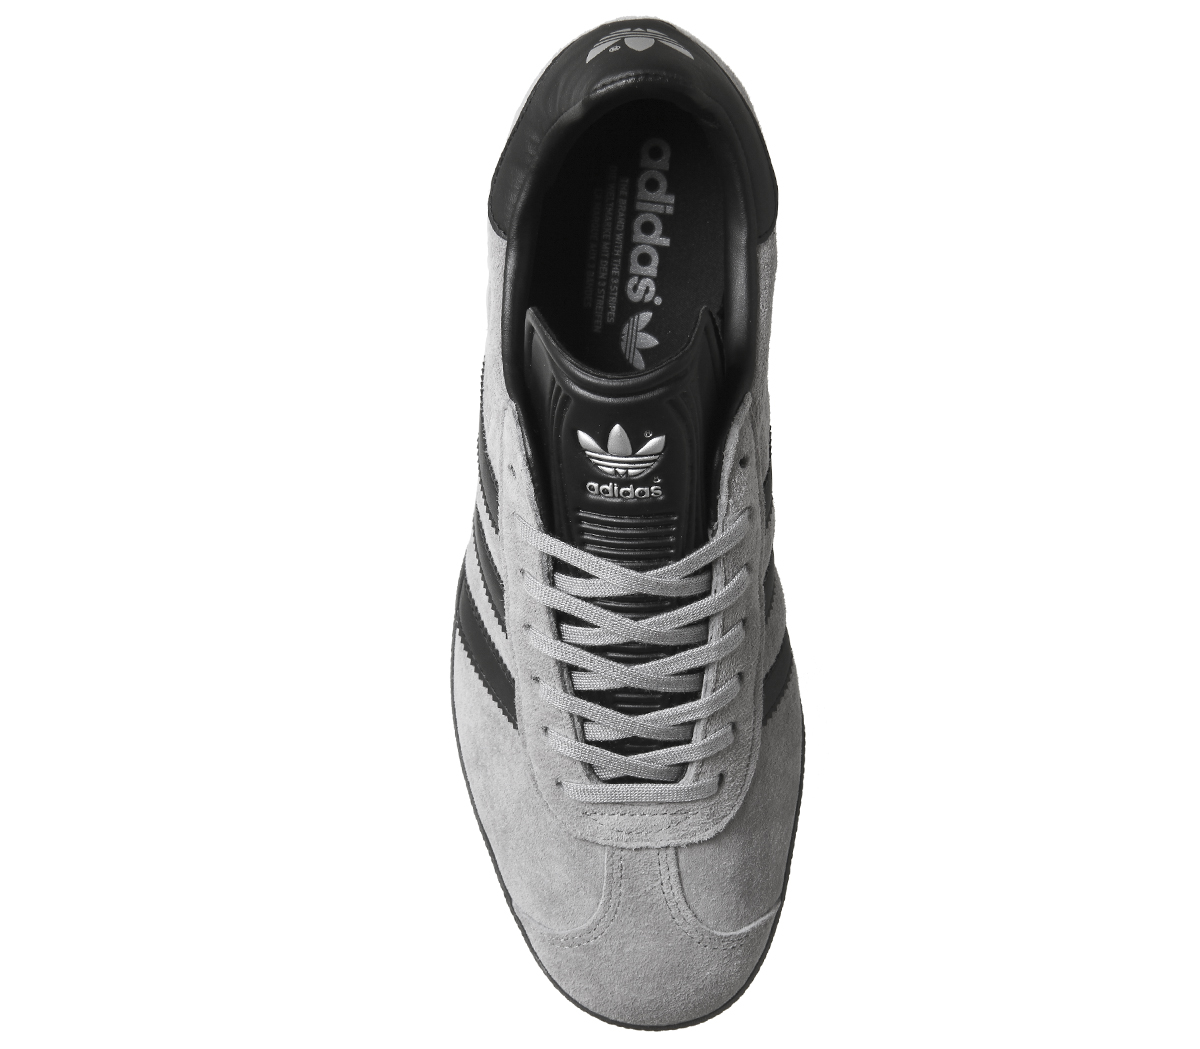 da4b2711007a3 Sentinel Mens Adidas Gazelle Trainers Grey Black Exclusive Trainers Shoes